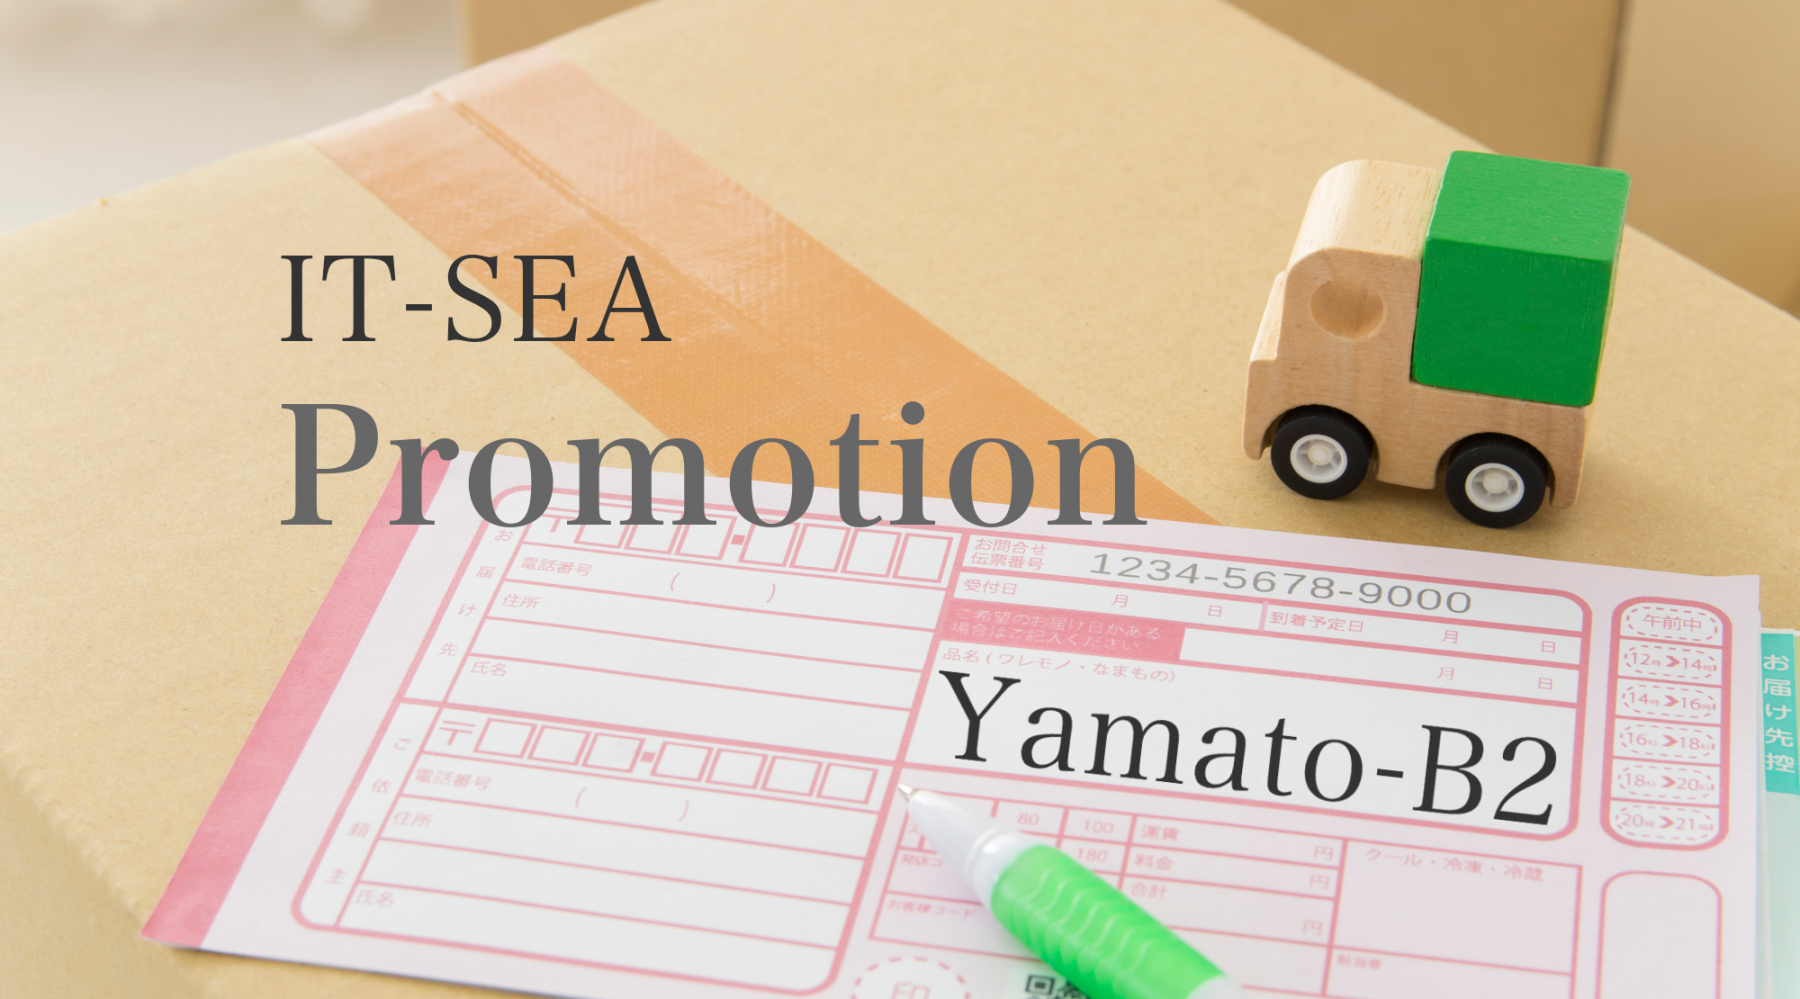 Promotion-B2